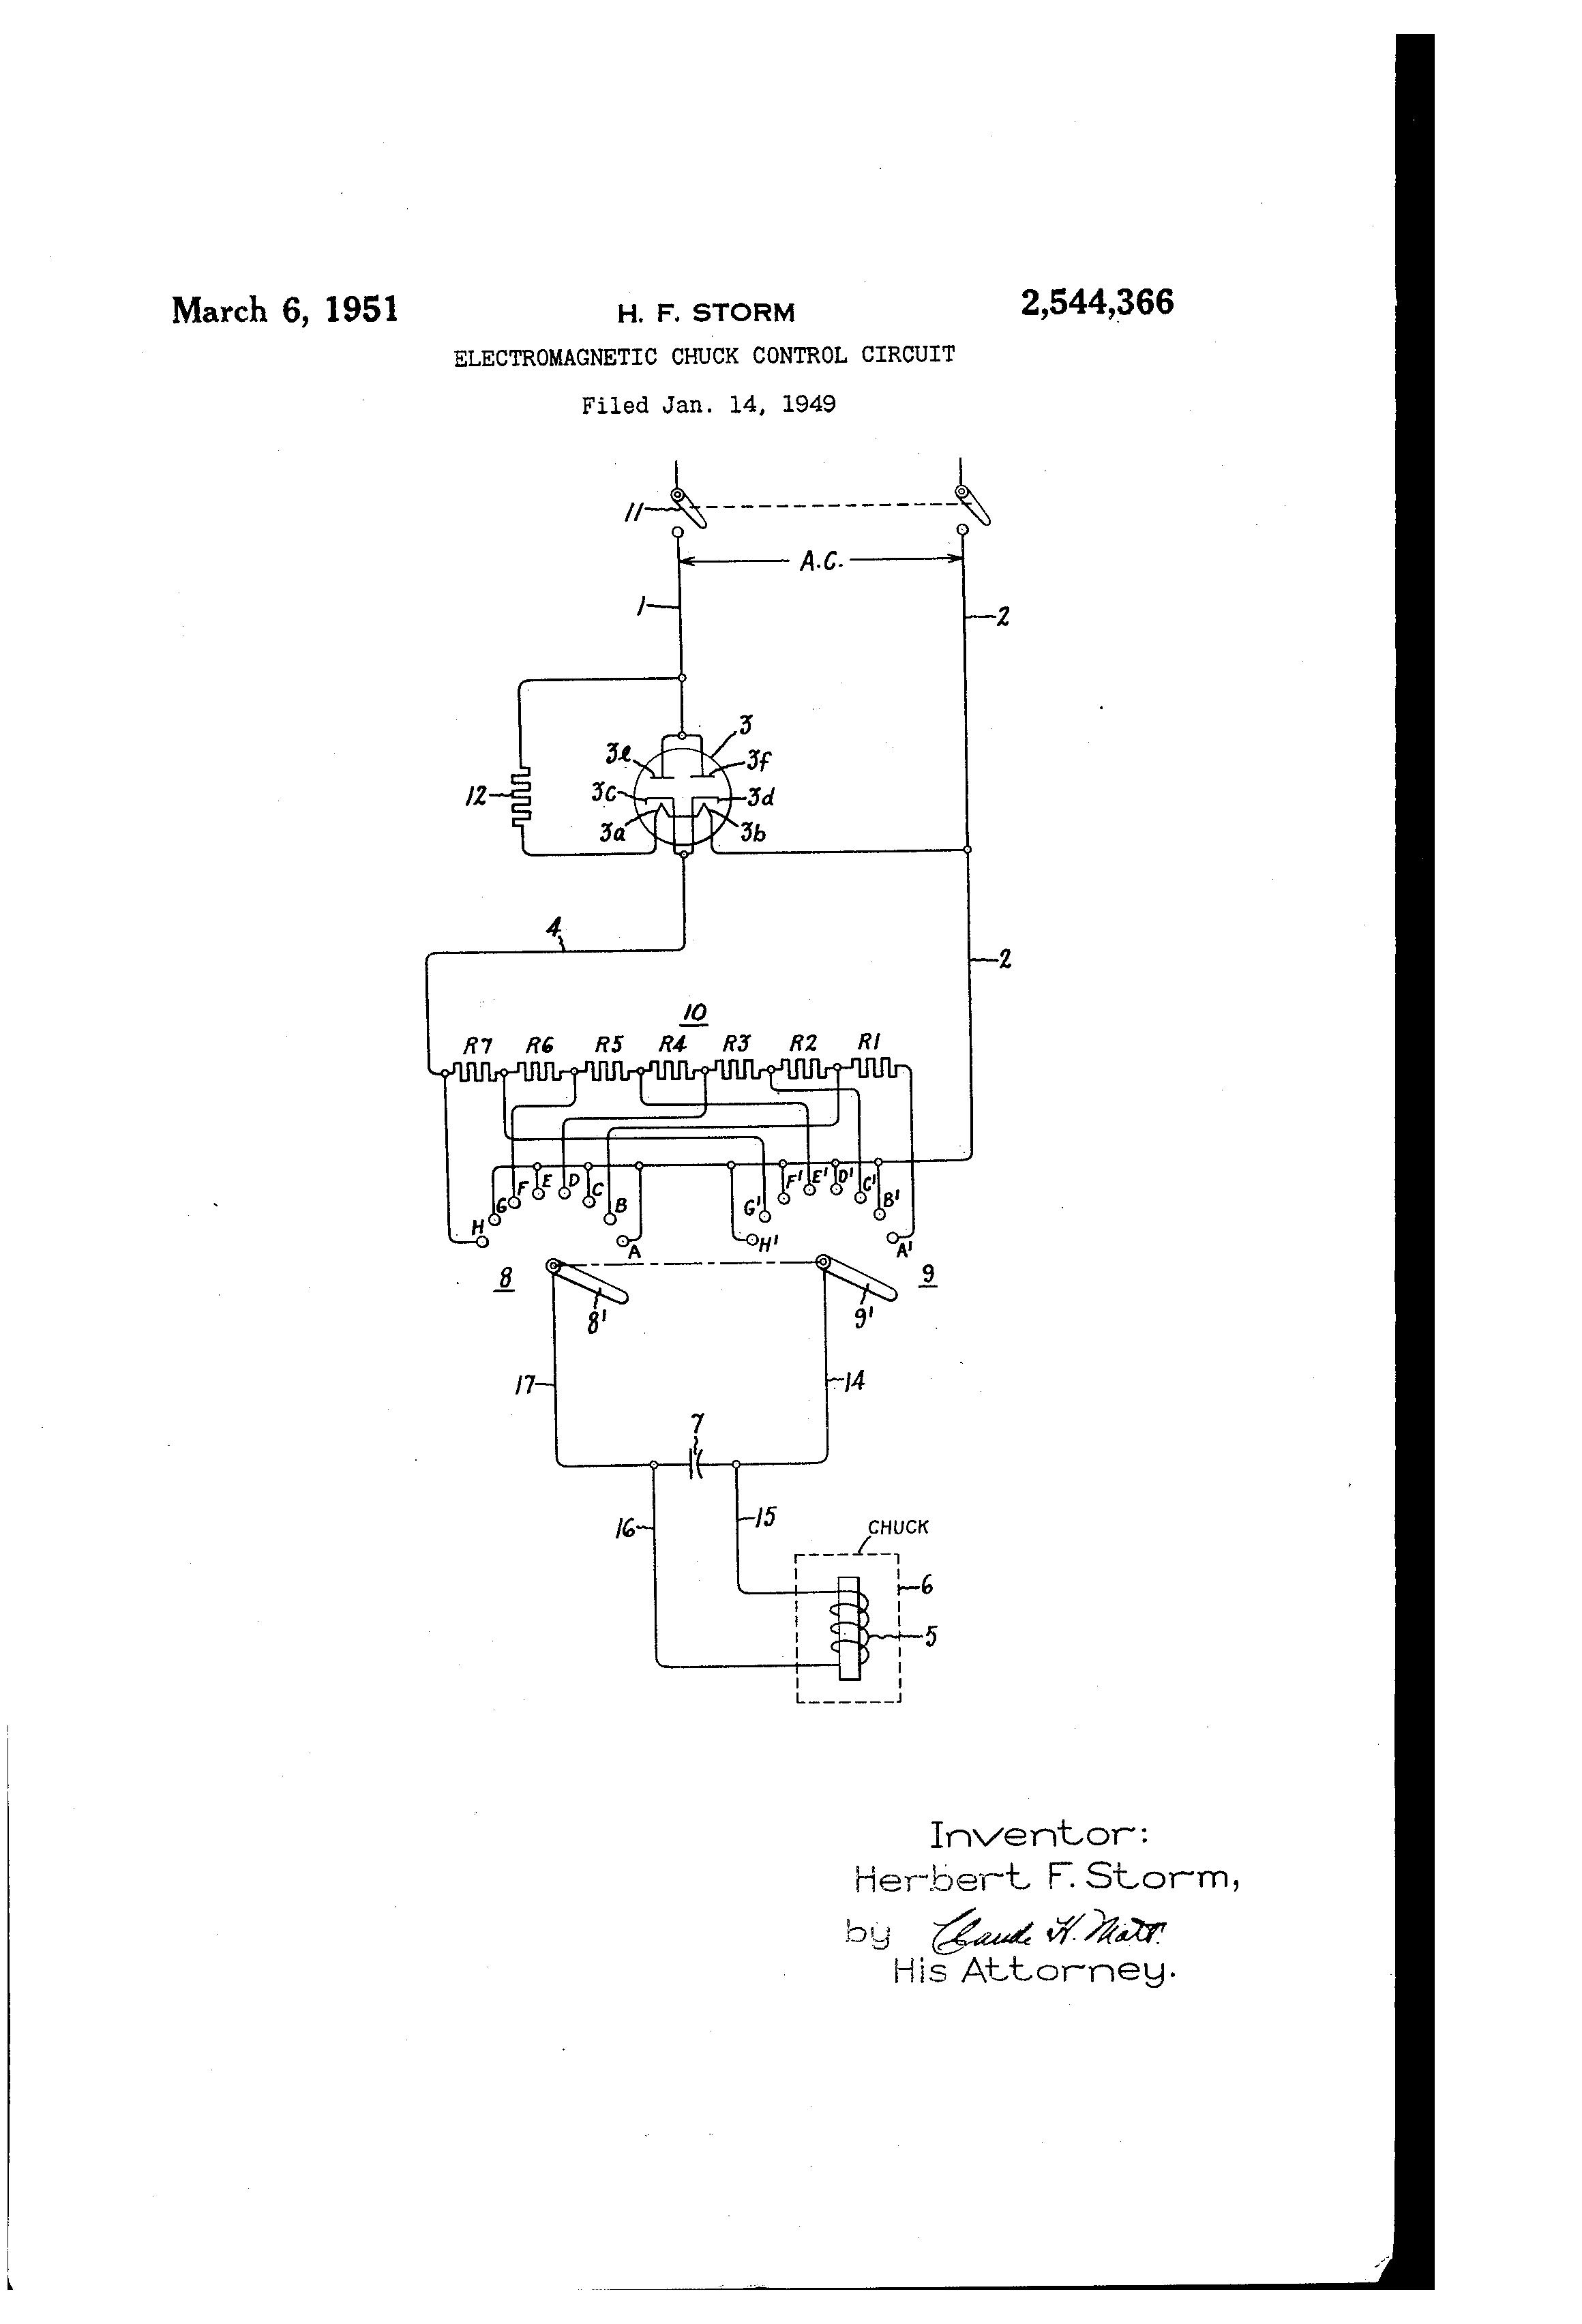 A Schematic Diagram Electromagnetic on hall effect speed sensor schematic, electric furnace schematic, hall switch schematic, dr. bob beck brain tuner schematic, h bridge schematic,